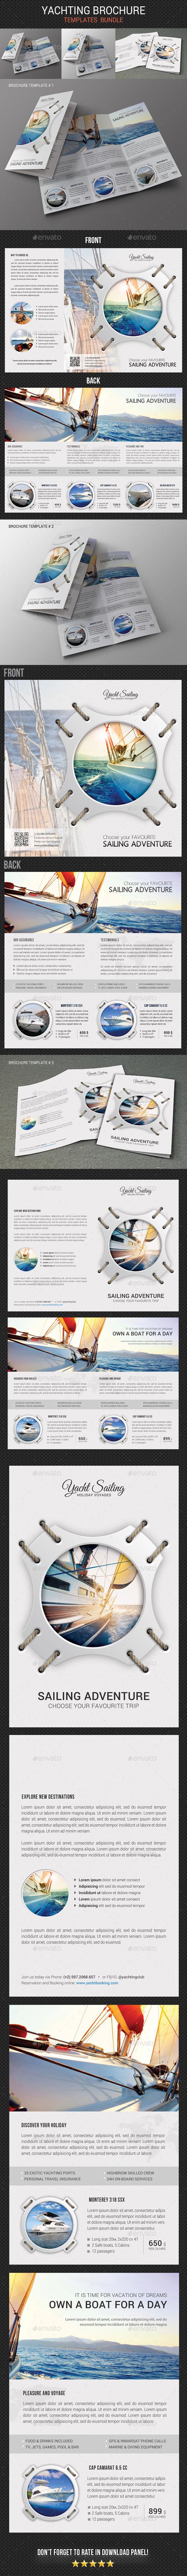 Yachting Brochure Bundle 2 - Brochures Print Templates